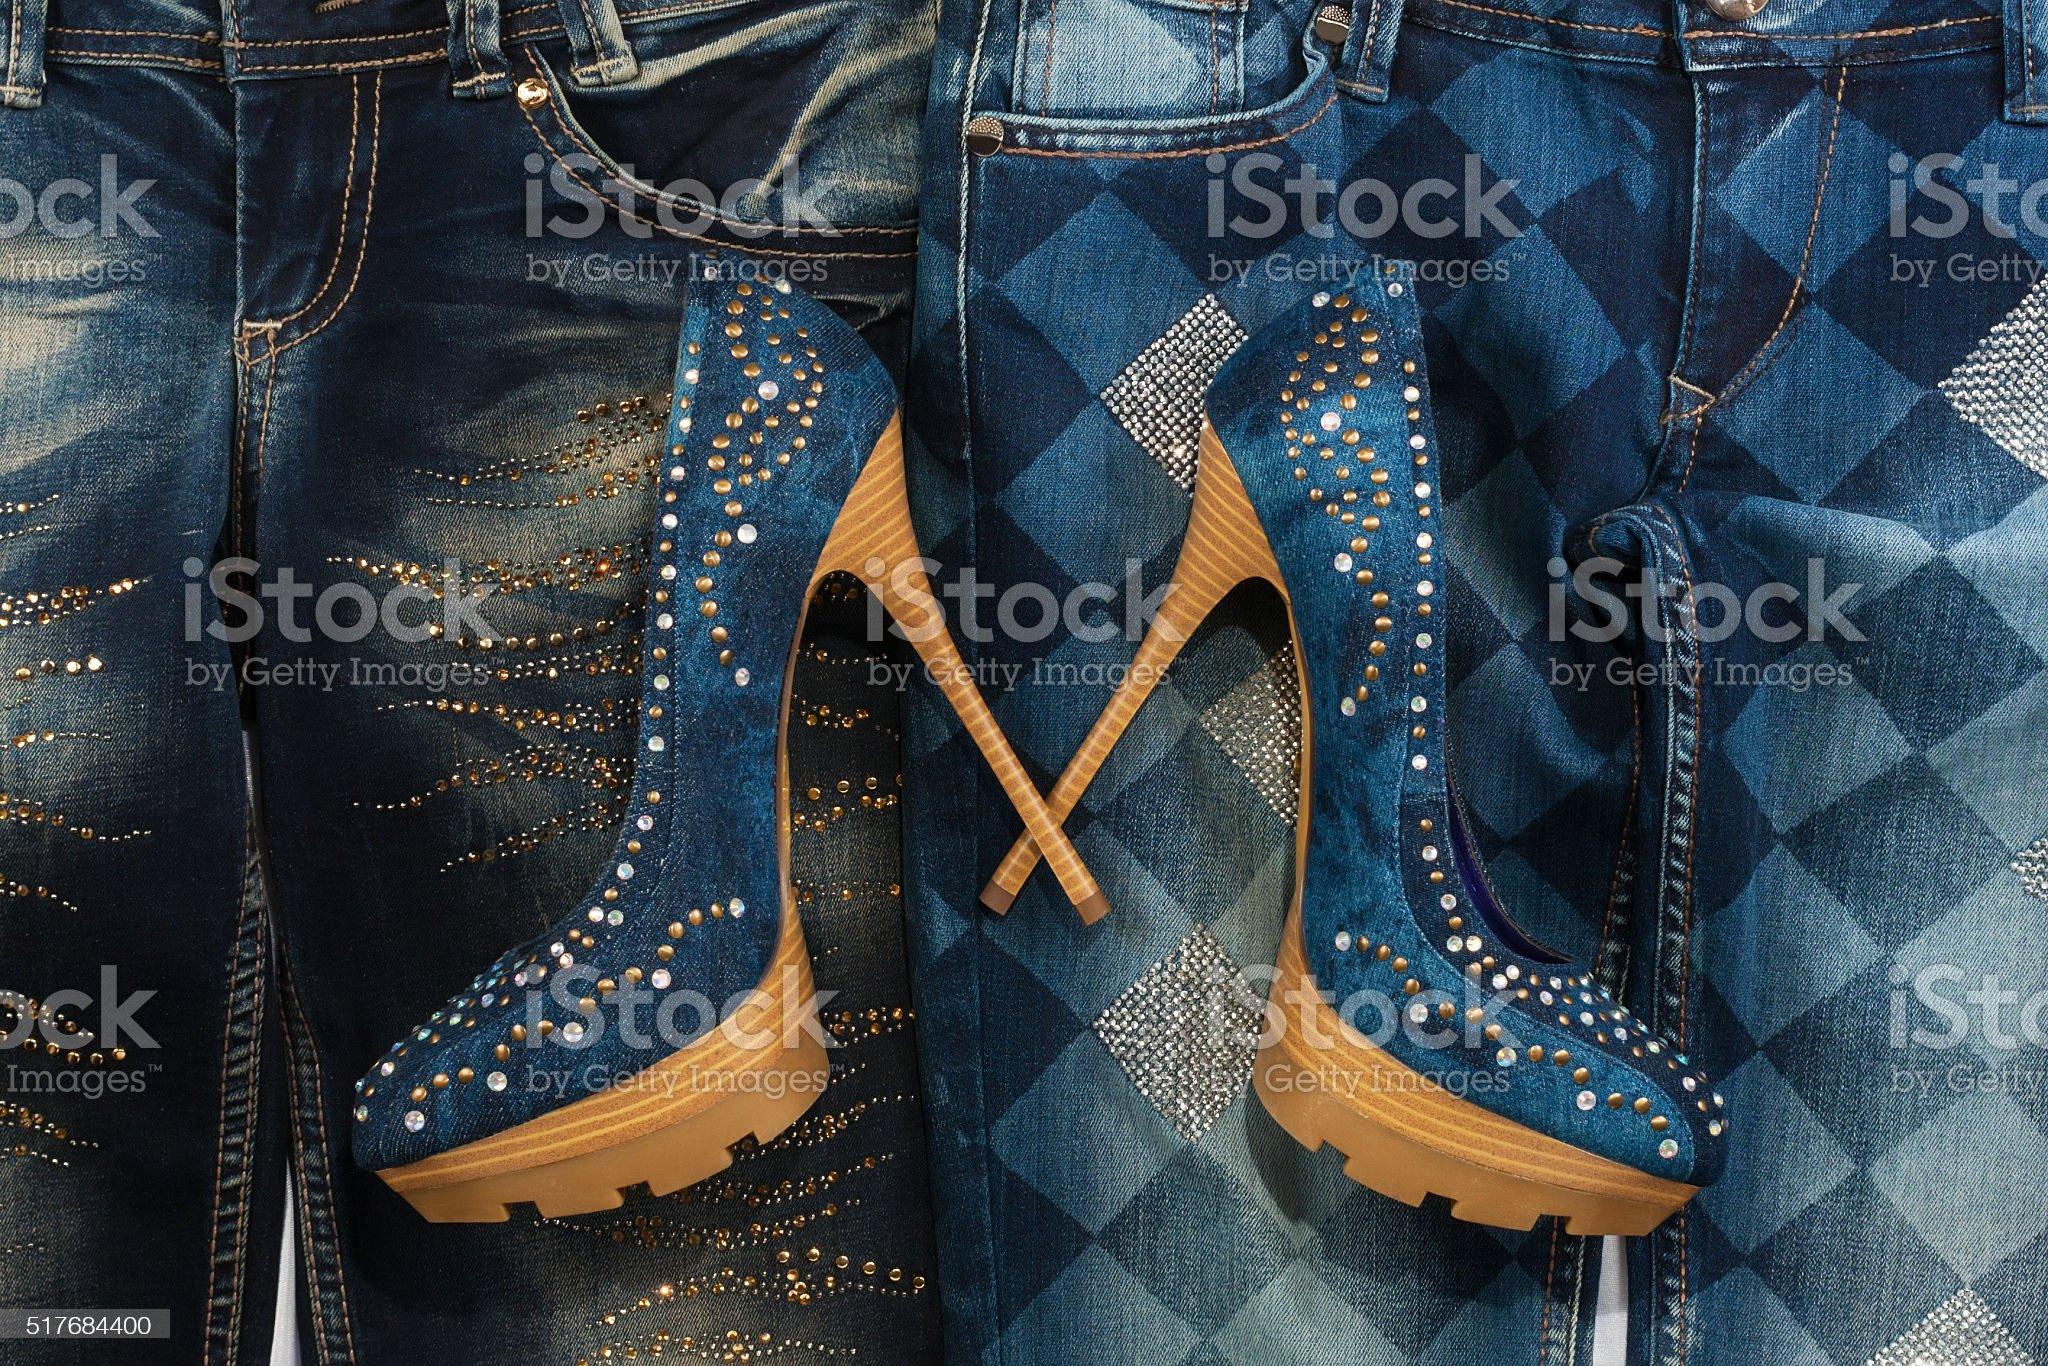 Imagen De Mujer Glamorosa Moda Pantalones Vaqueros Zapatos En Diamantes De Imitacion Tendido Sobre Pantalones Fotografia De Stock